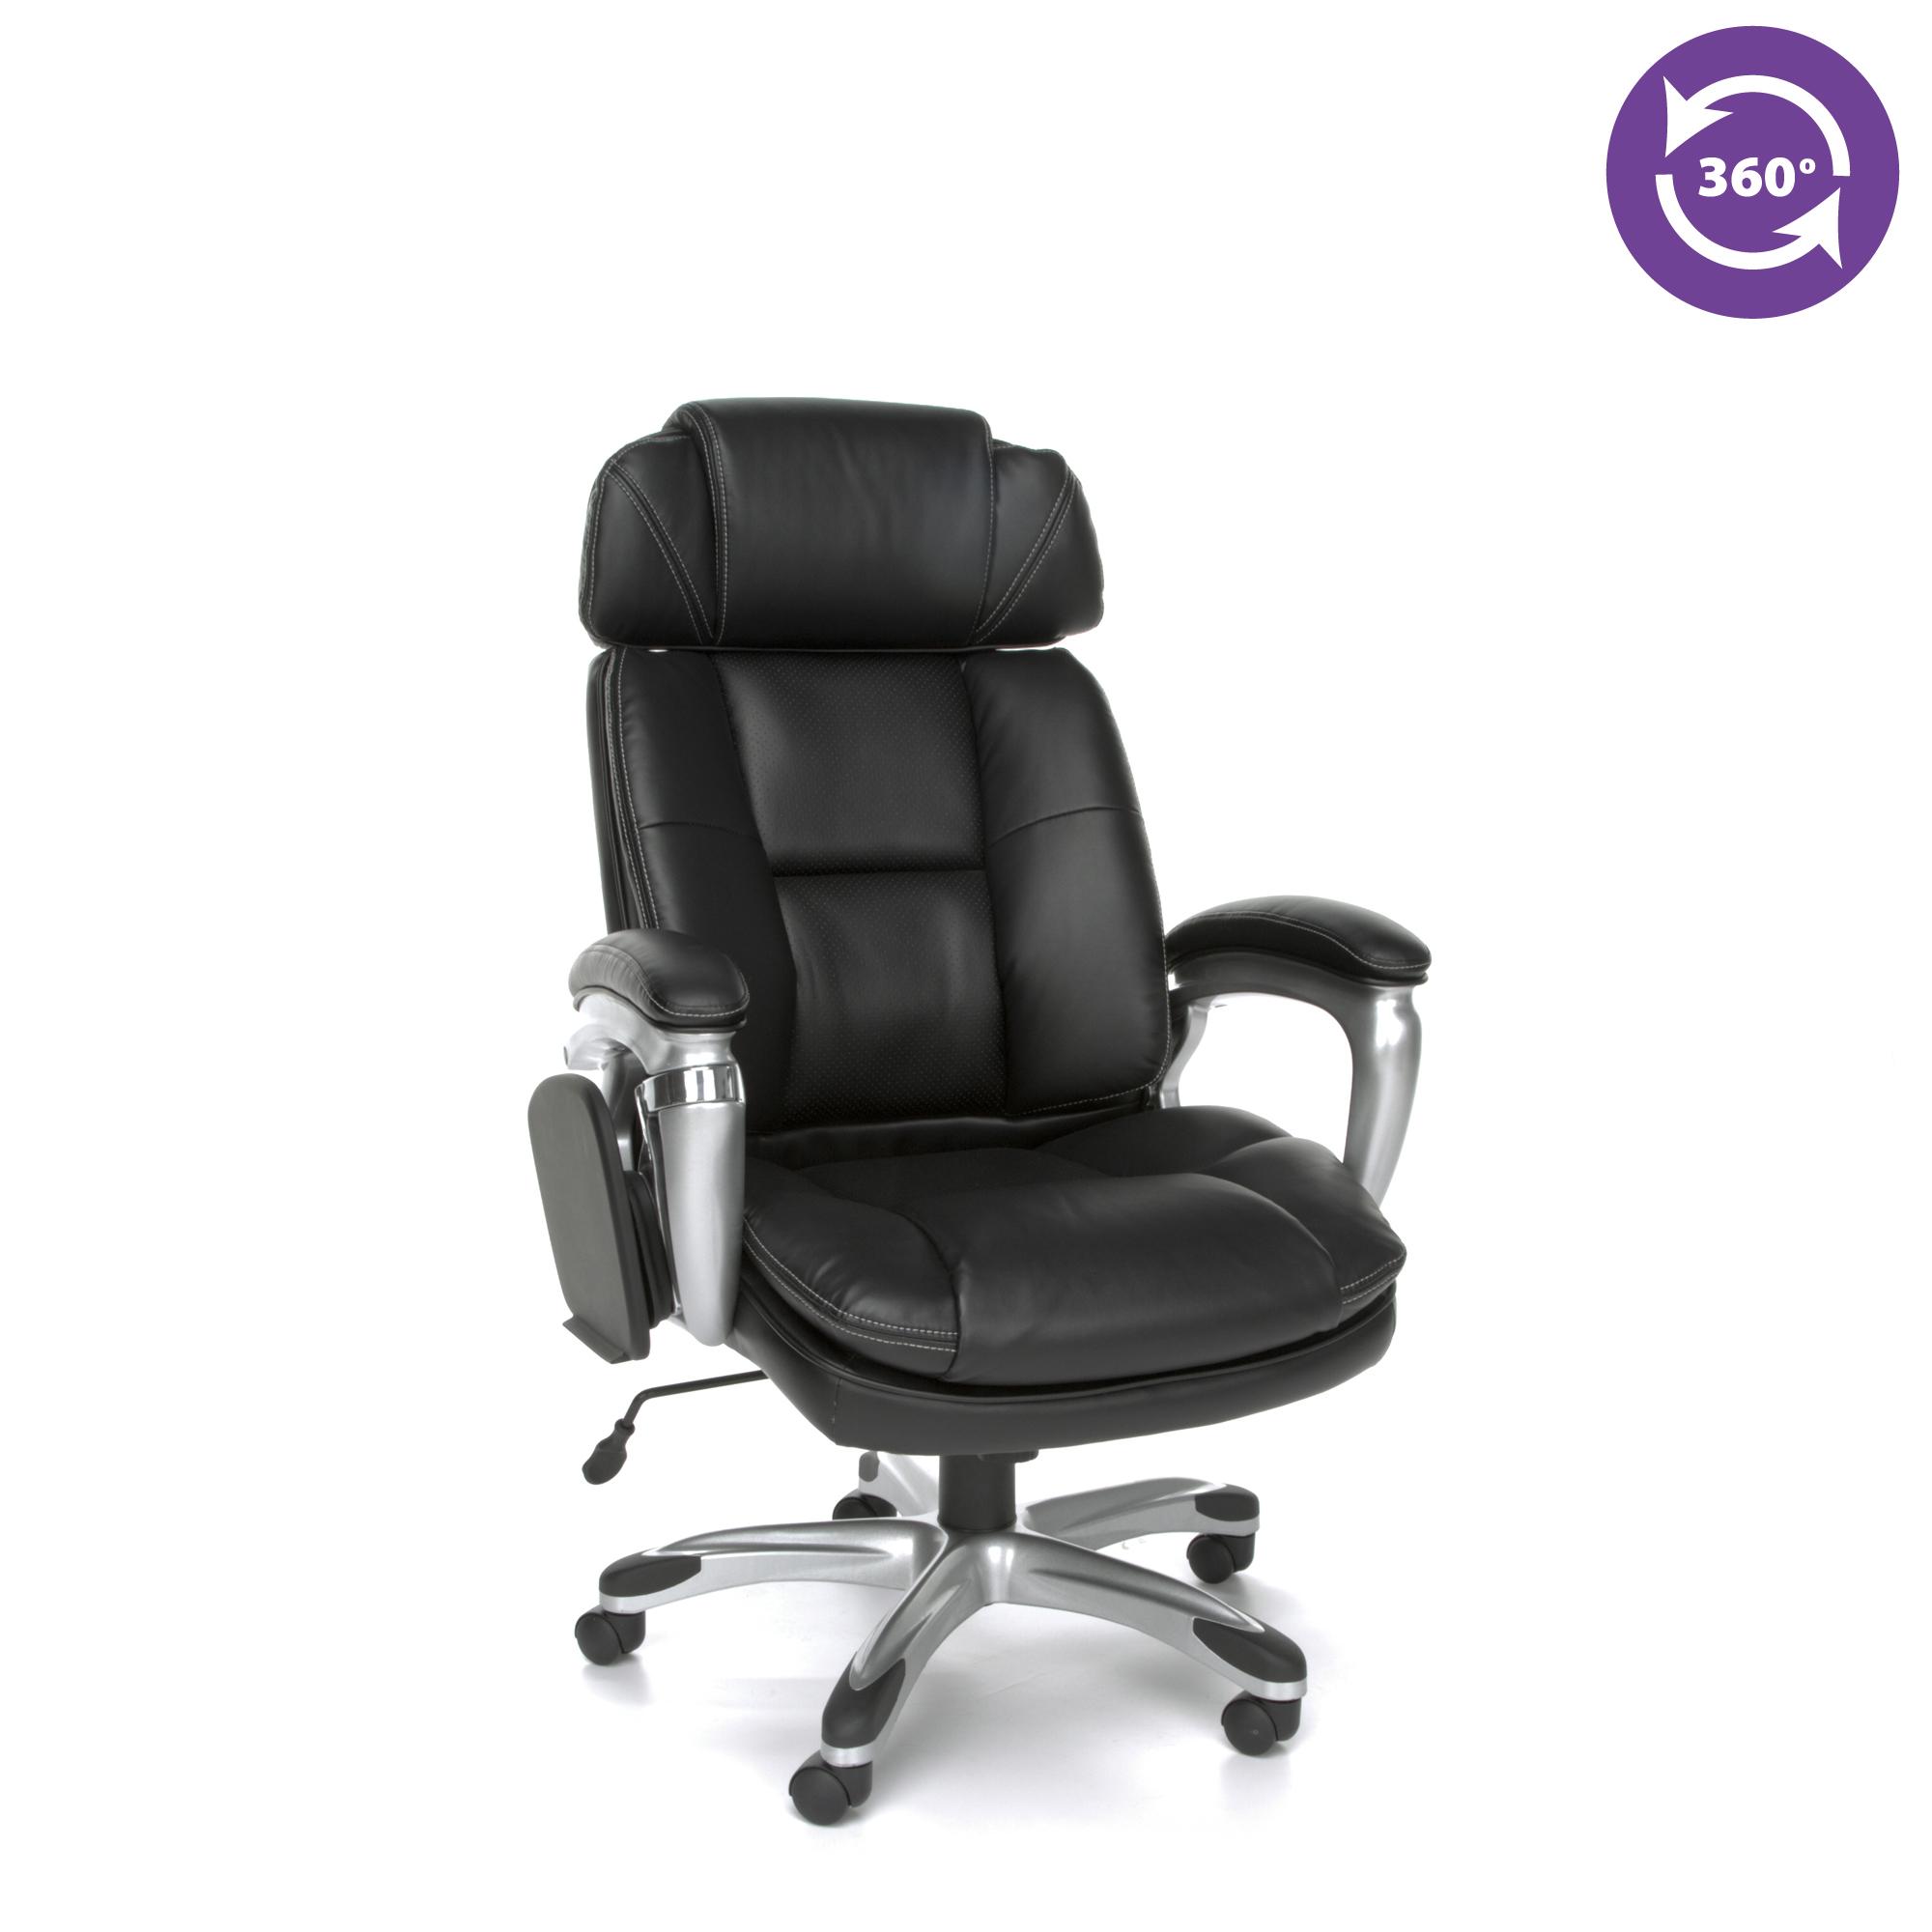 office chair back view. \u003cspan\u003e360° View - Drag To Spin\u003c\/span\u003e, Double Office Chair Back